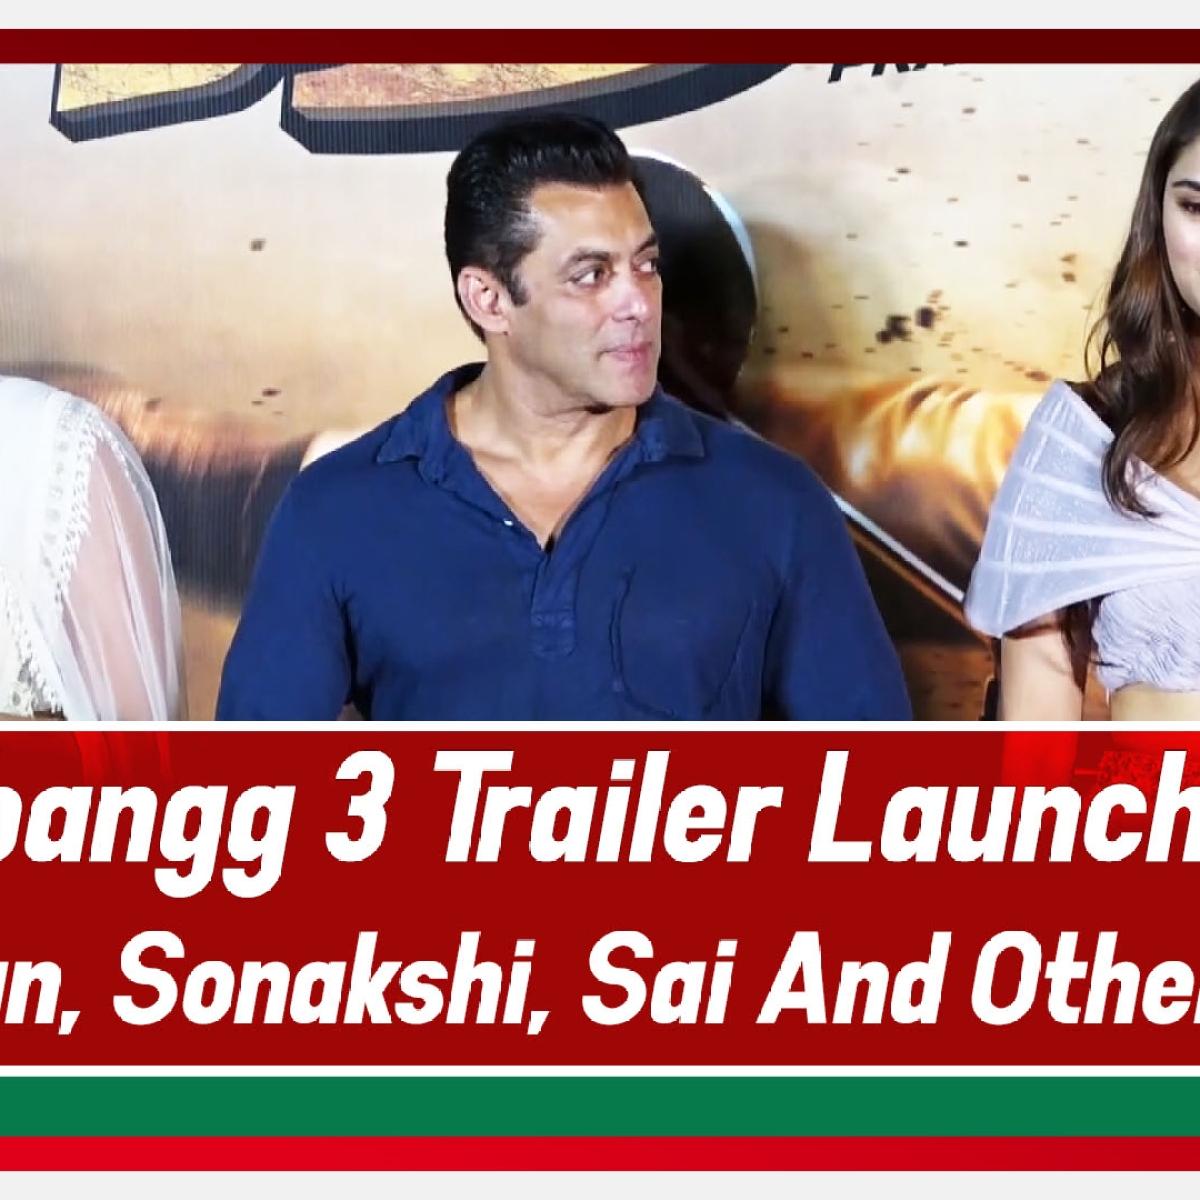 Dabangg 3 Official Trailer Launch | Salman Khan | Sonakshi | Sai and Prabhu deva And Others